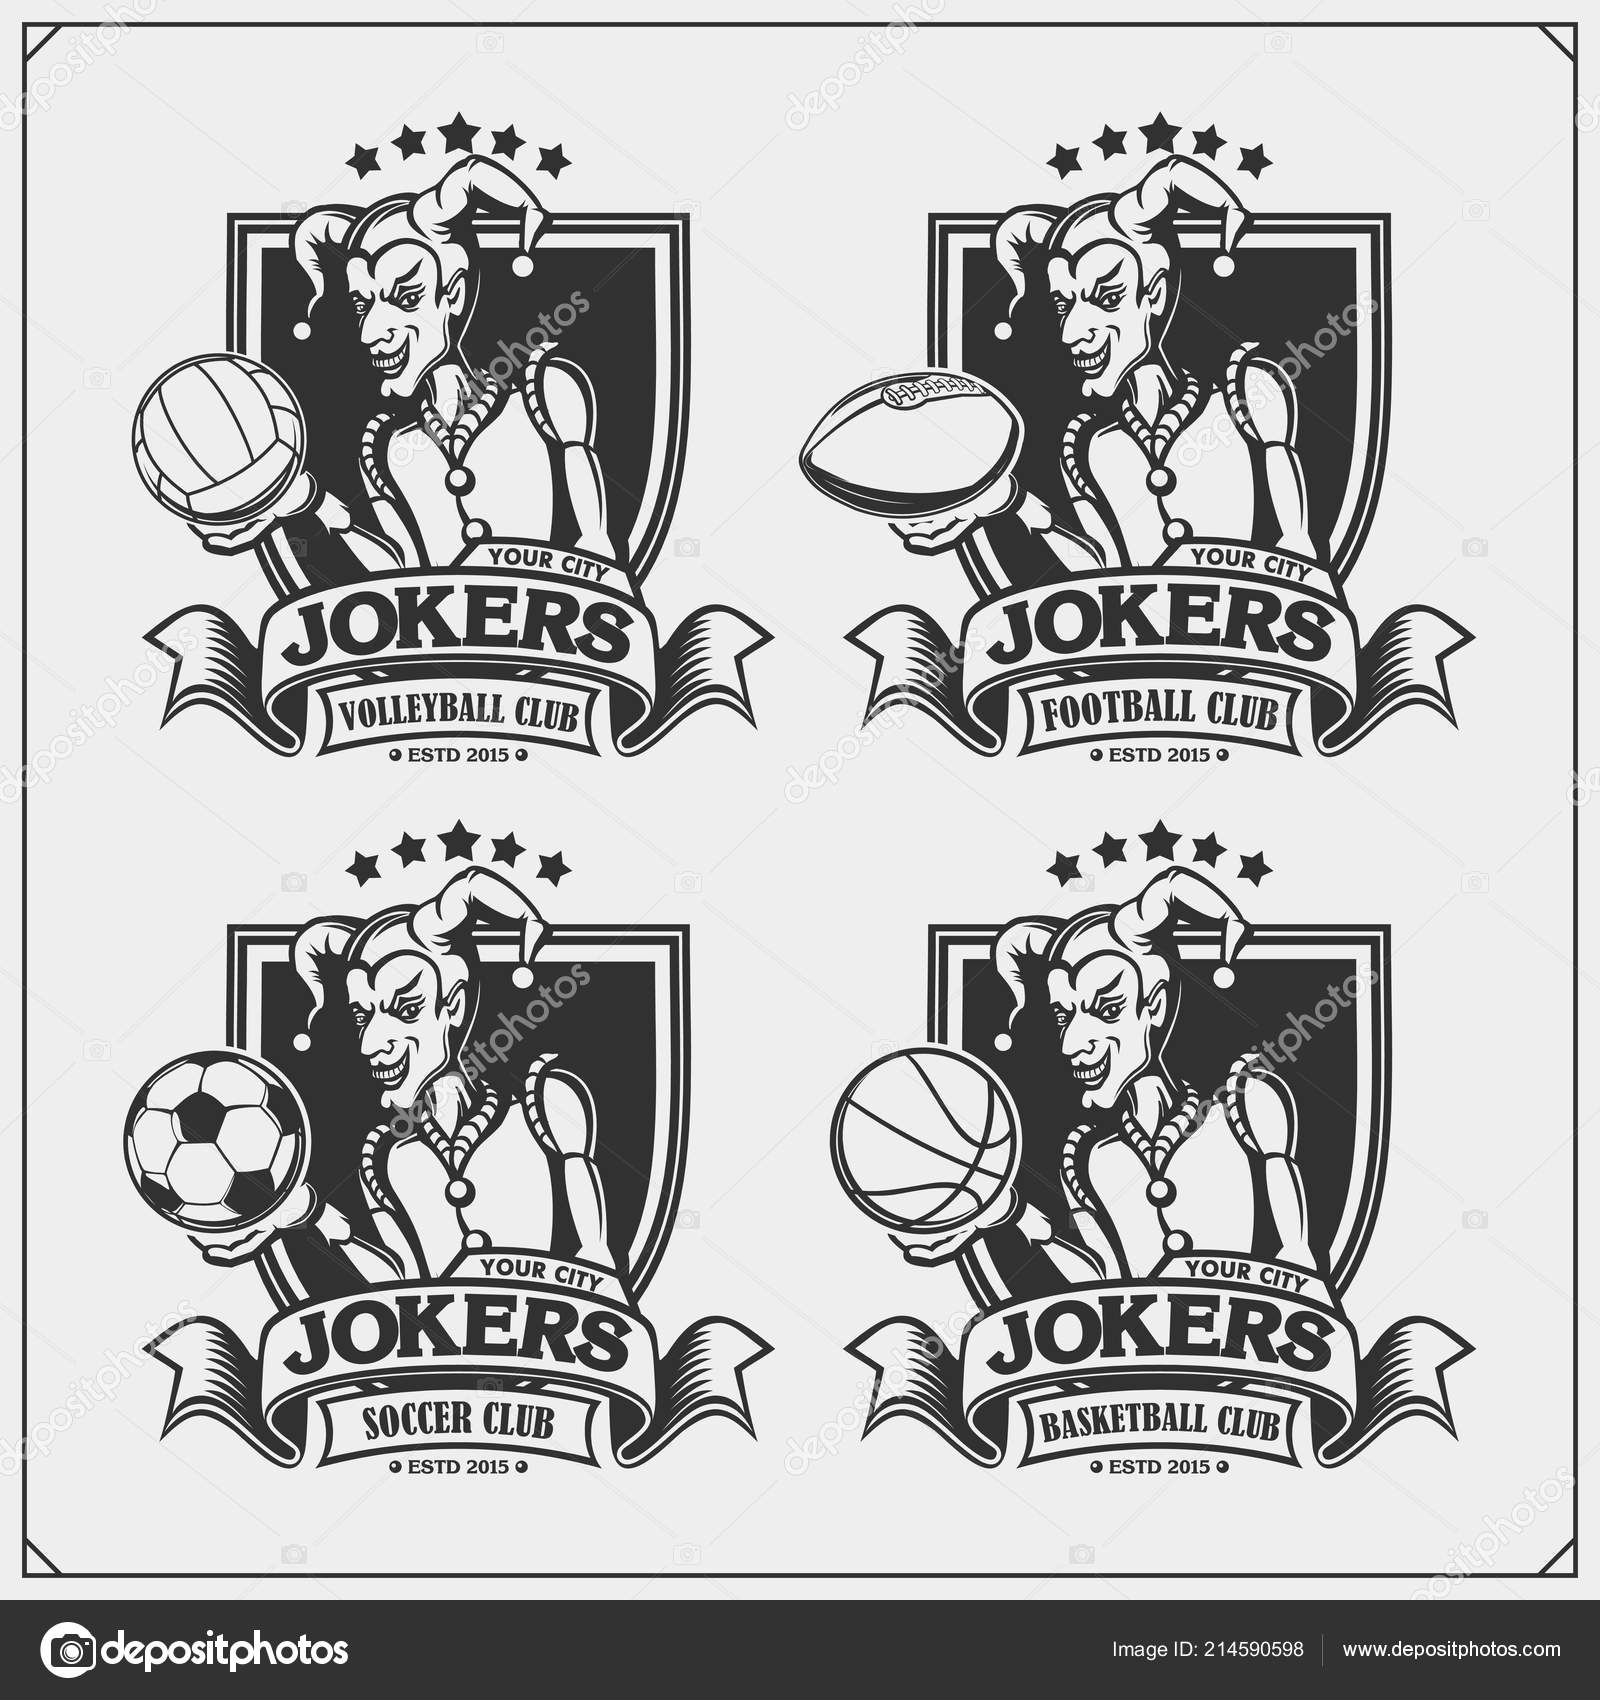 Volleyball baseball soccer football logos labels sport club emblems joker stock vector